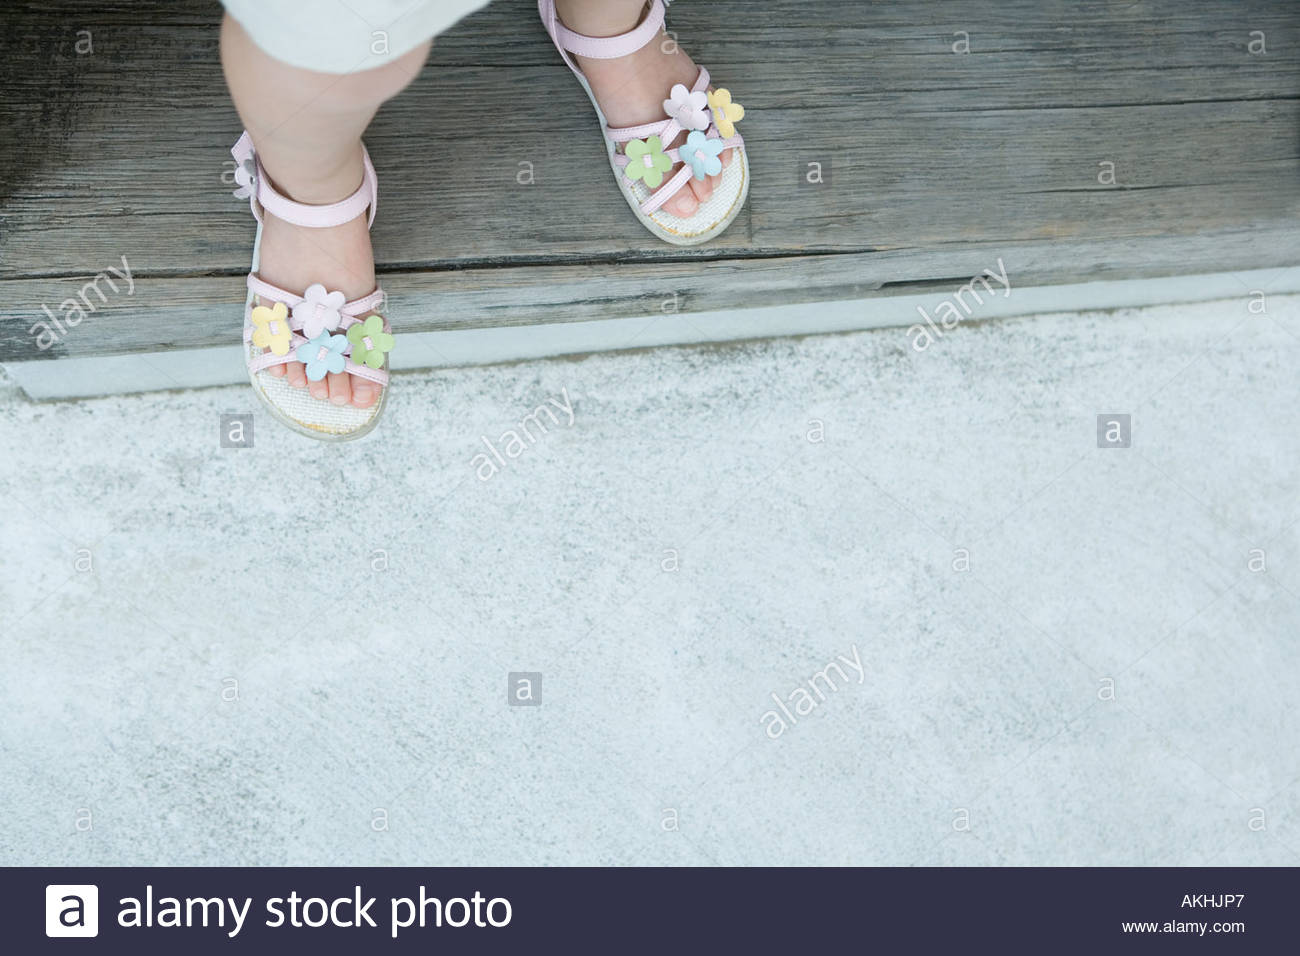 Chica que llevaba sandalias florales Imagen De Stock